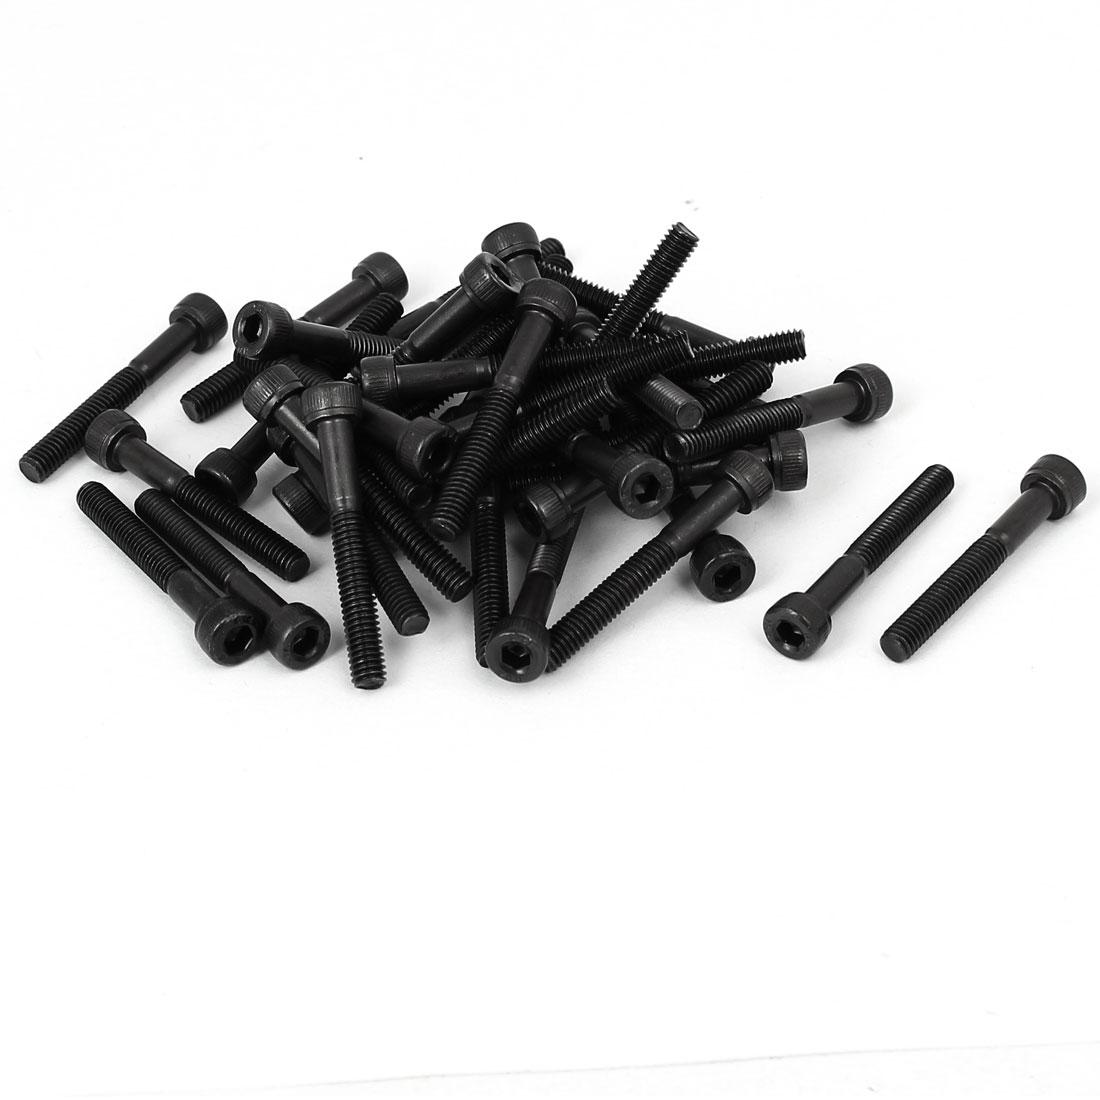 M4 x 30mm Alloy Steel Bolt Cap Point Hex Socket Head Screws Black 40PCS